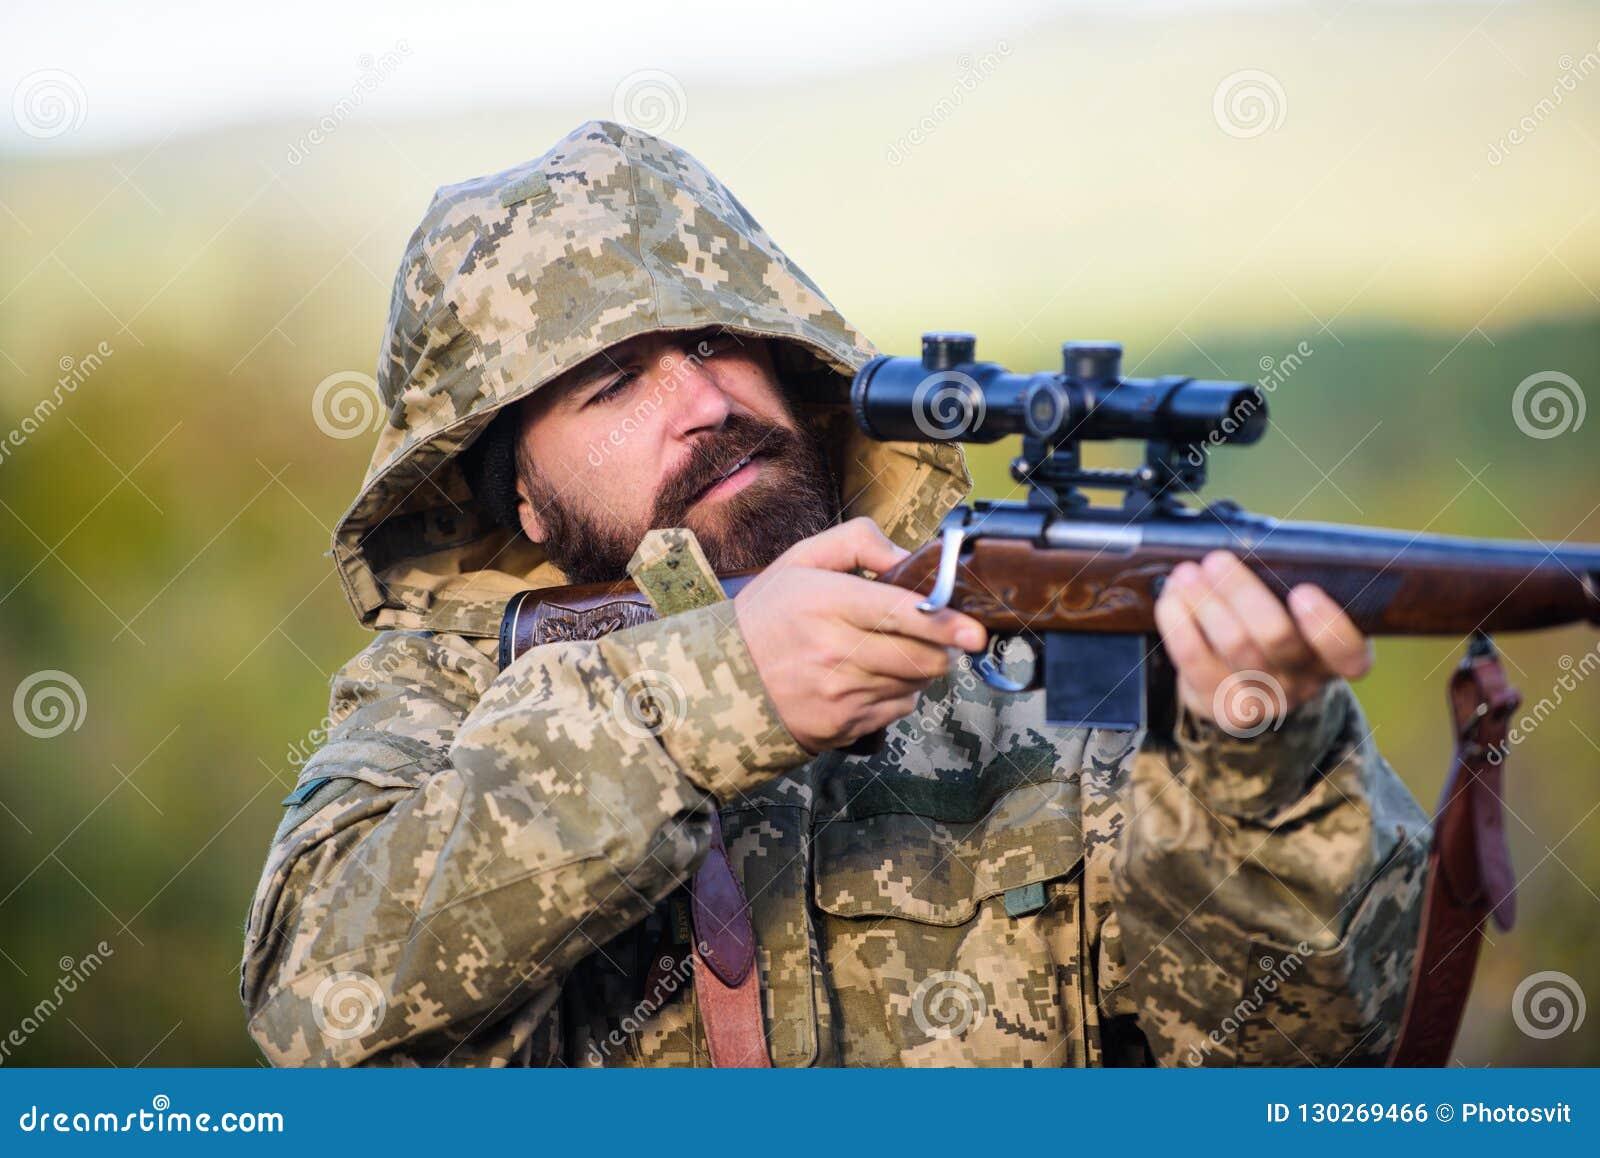 Kerljagd-Naturumwelt Bärtiger Jägergewehr-Naturhintergrund Erfahrung und Praxis leiht die Erfolgsjagd